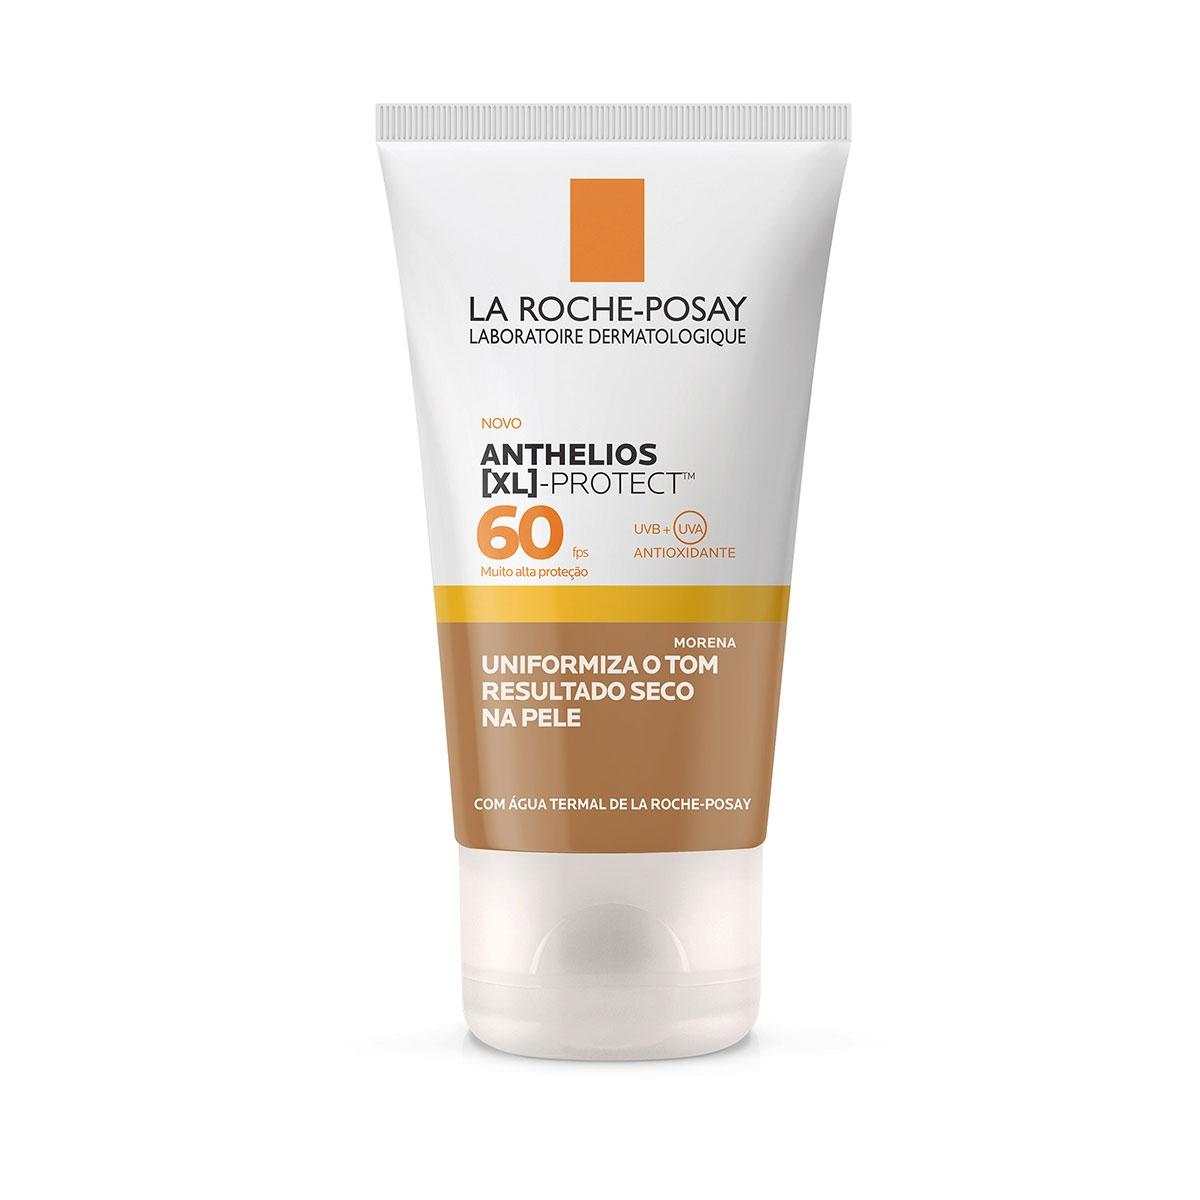 Protetor Solar Facial Anthelios XL Protect Cor Morena FPS60 La Roche-Posay 40g